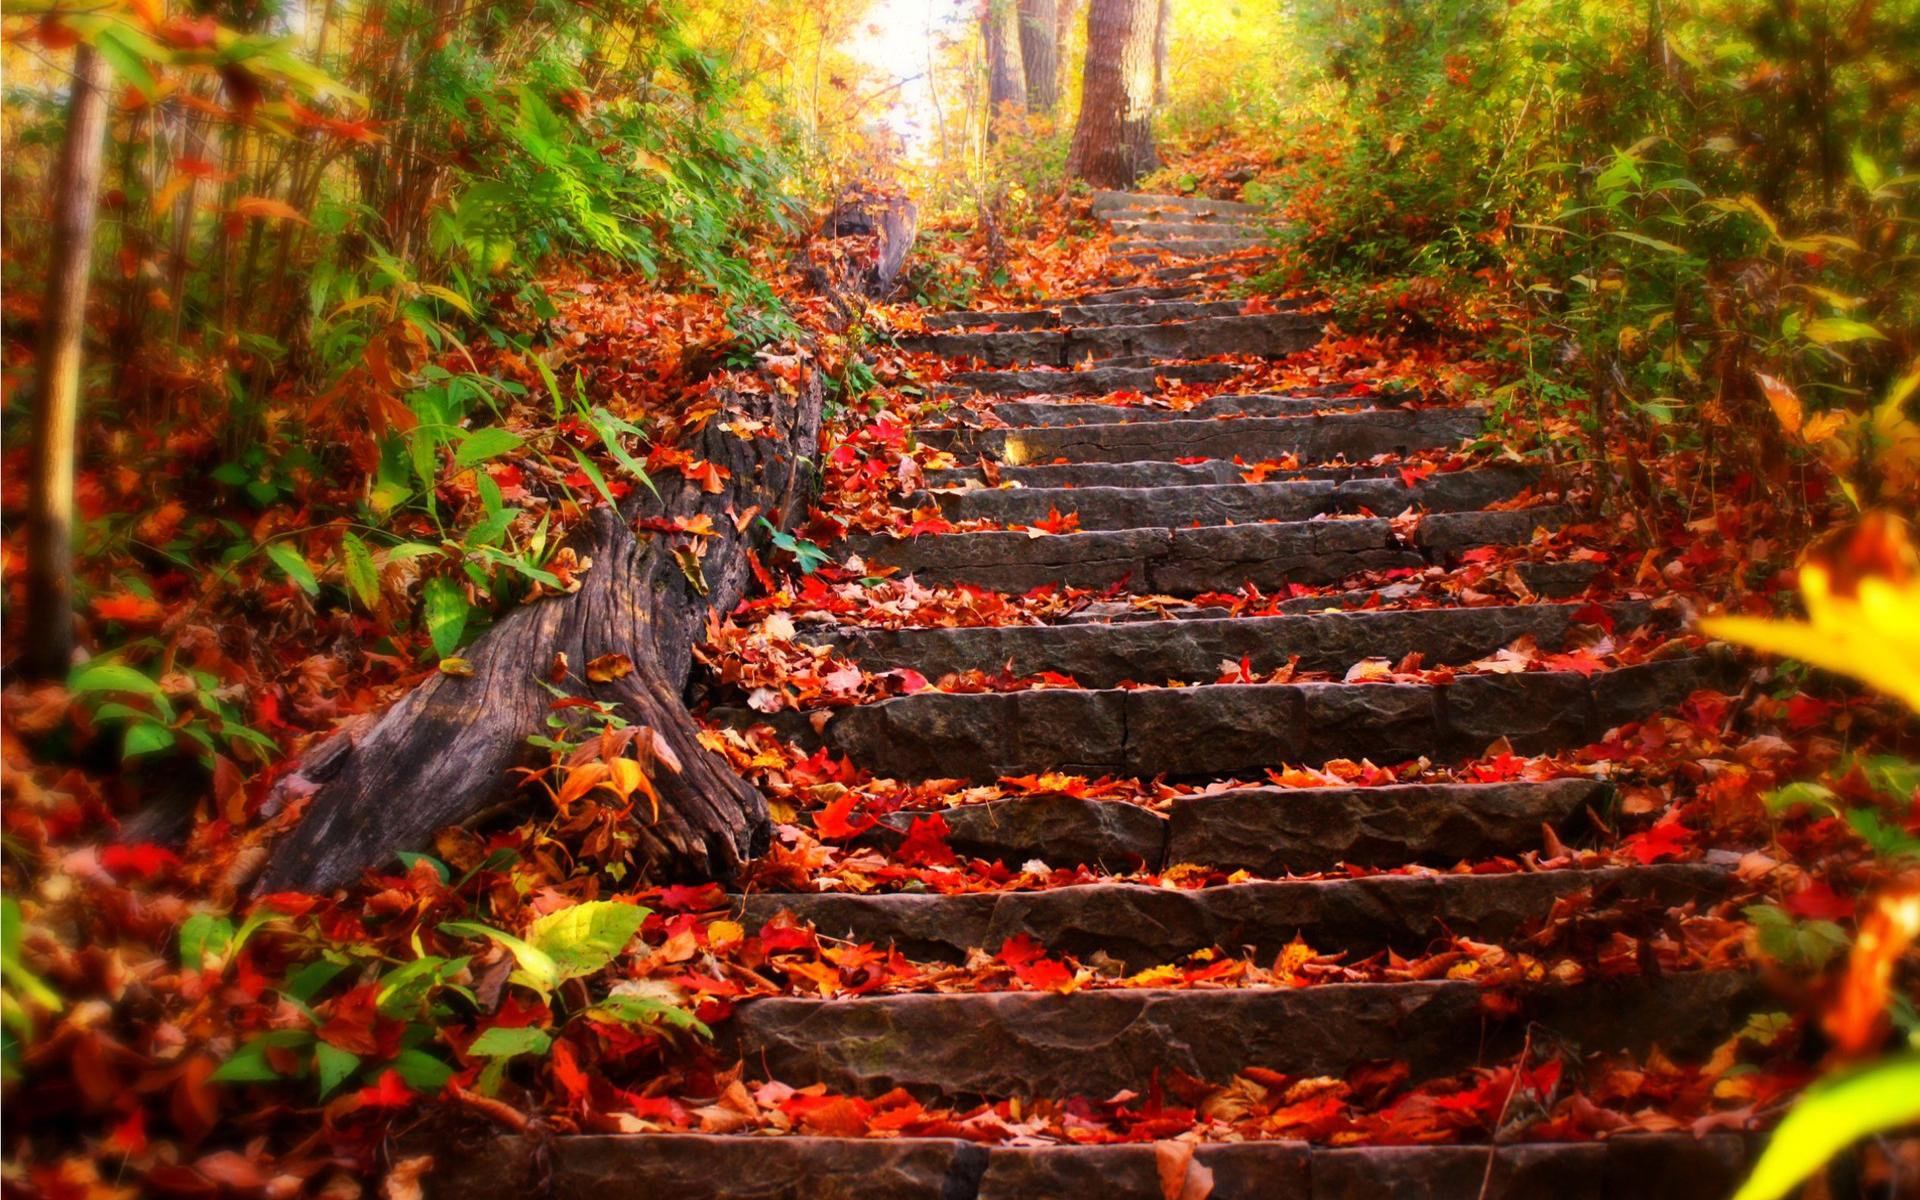 Fall Background Images - WallpaperSafari